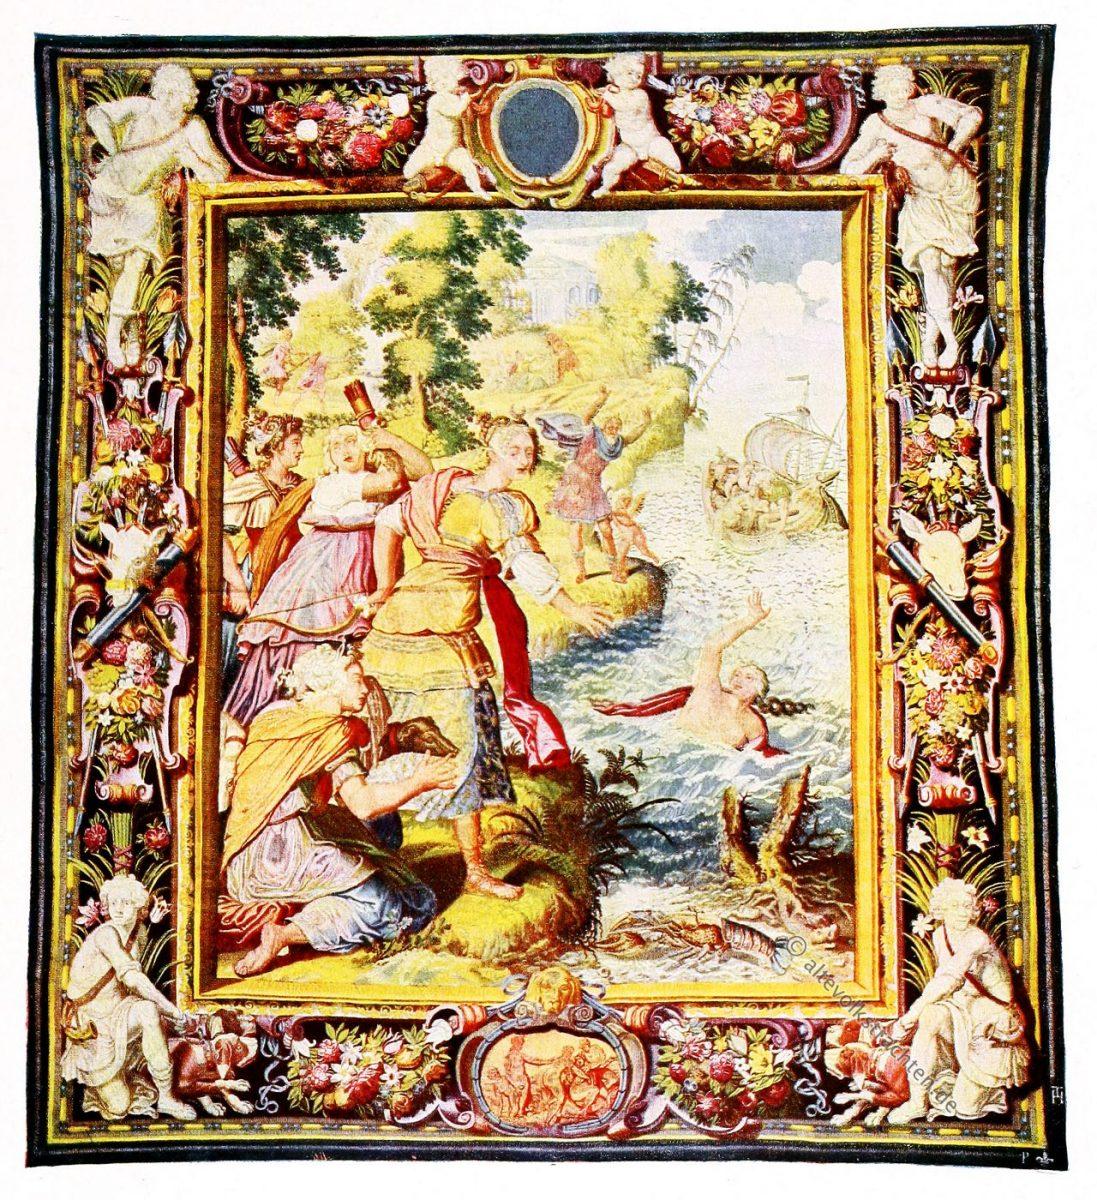 Gobelin, Barock, Minos, Britomartis, Nymphe, Kunsthistorie, Gobelinsammlung, 17. Jahrhundert